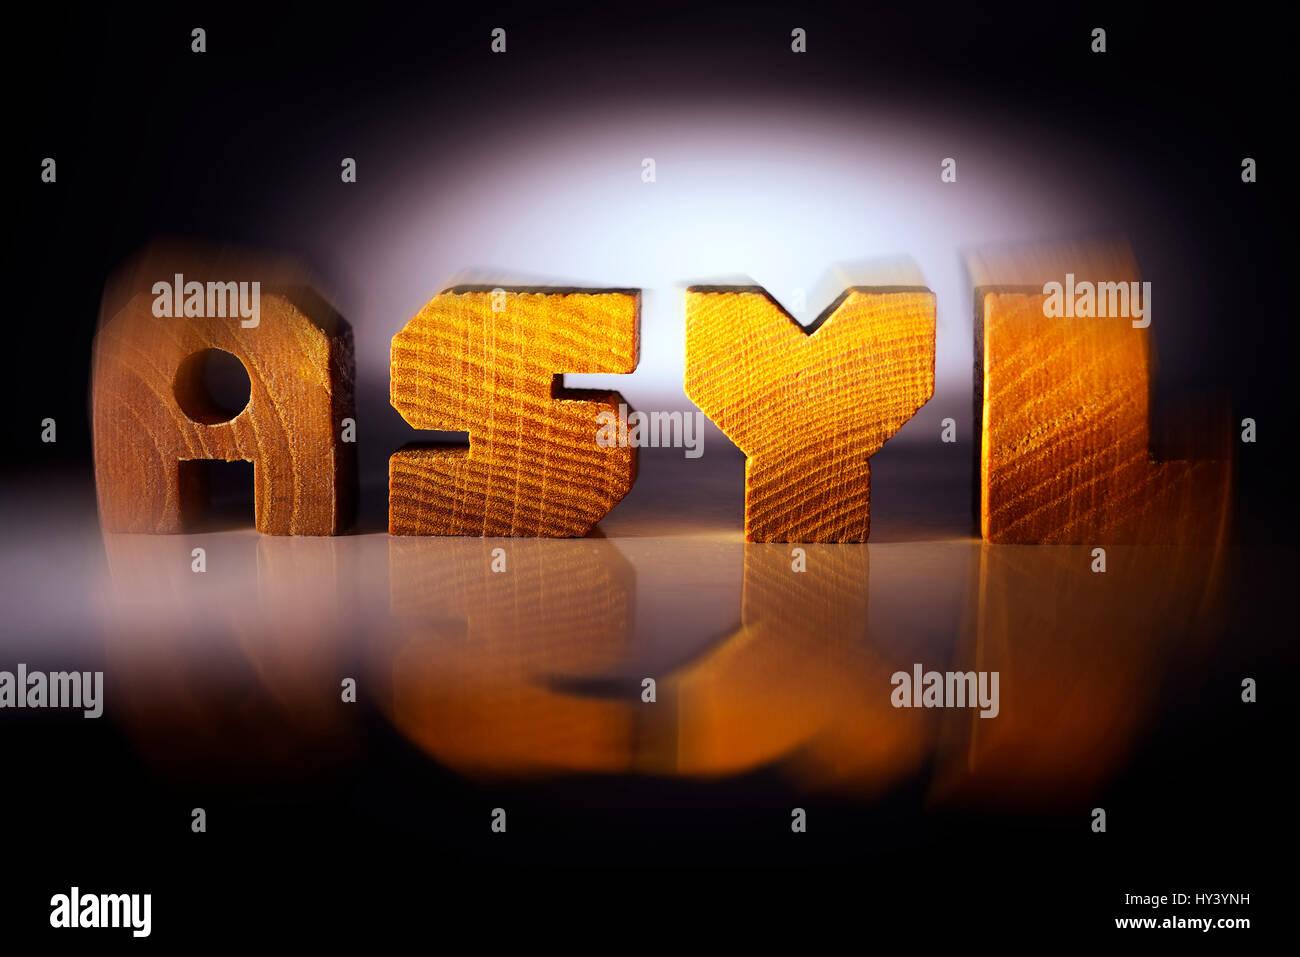 The word Asylum from wooden letter, Das Wort Asyl aus Holzbuchstaben - Stock Image